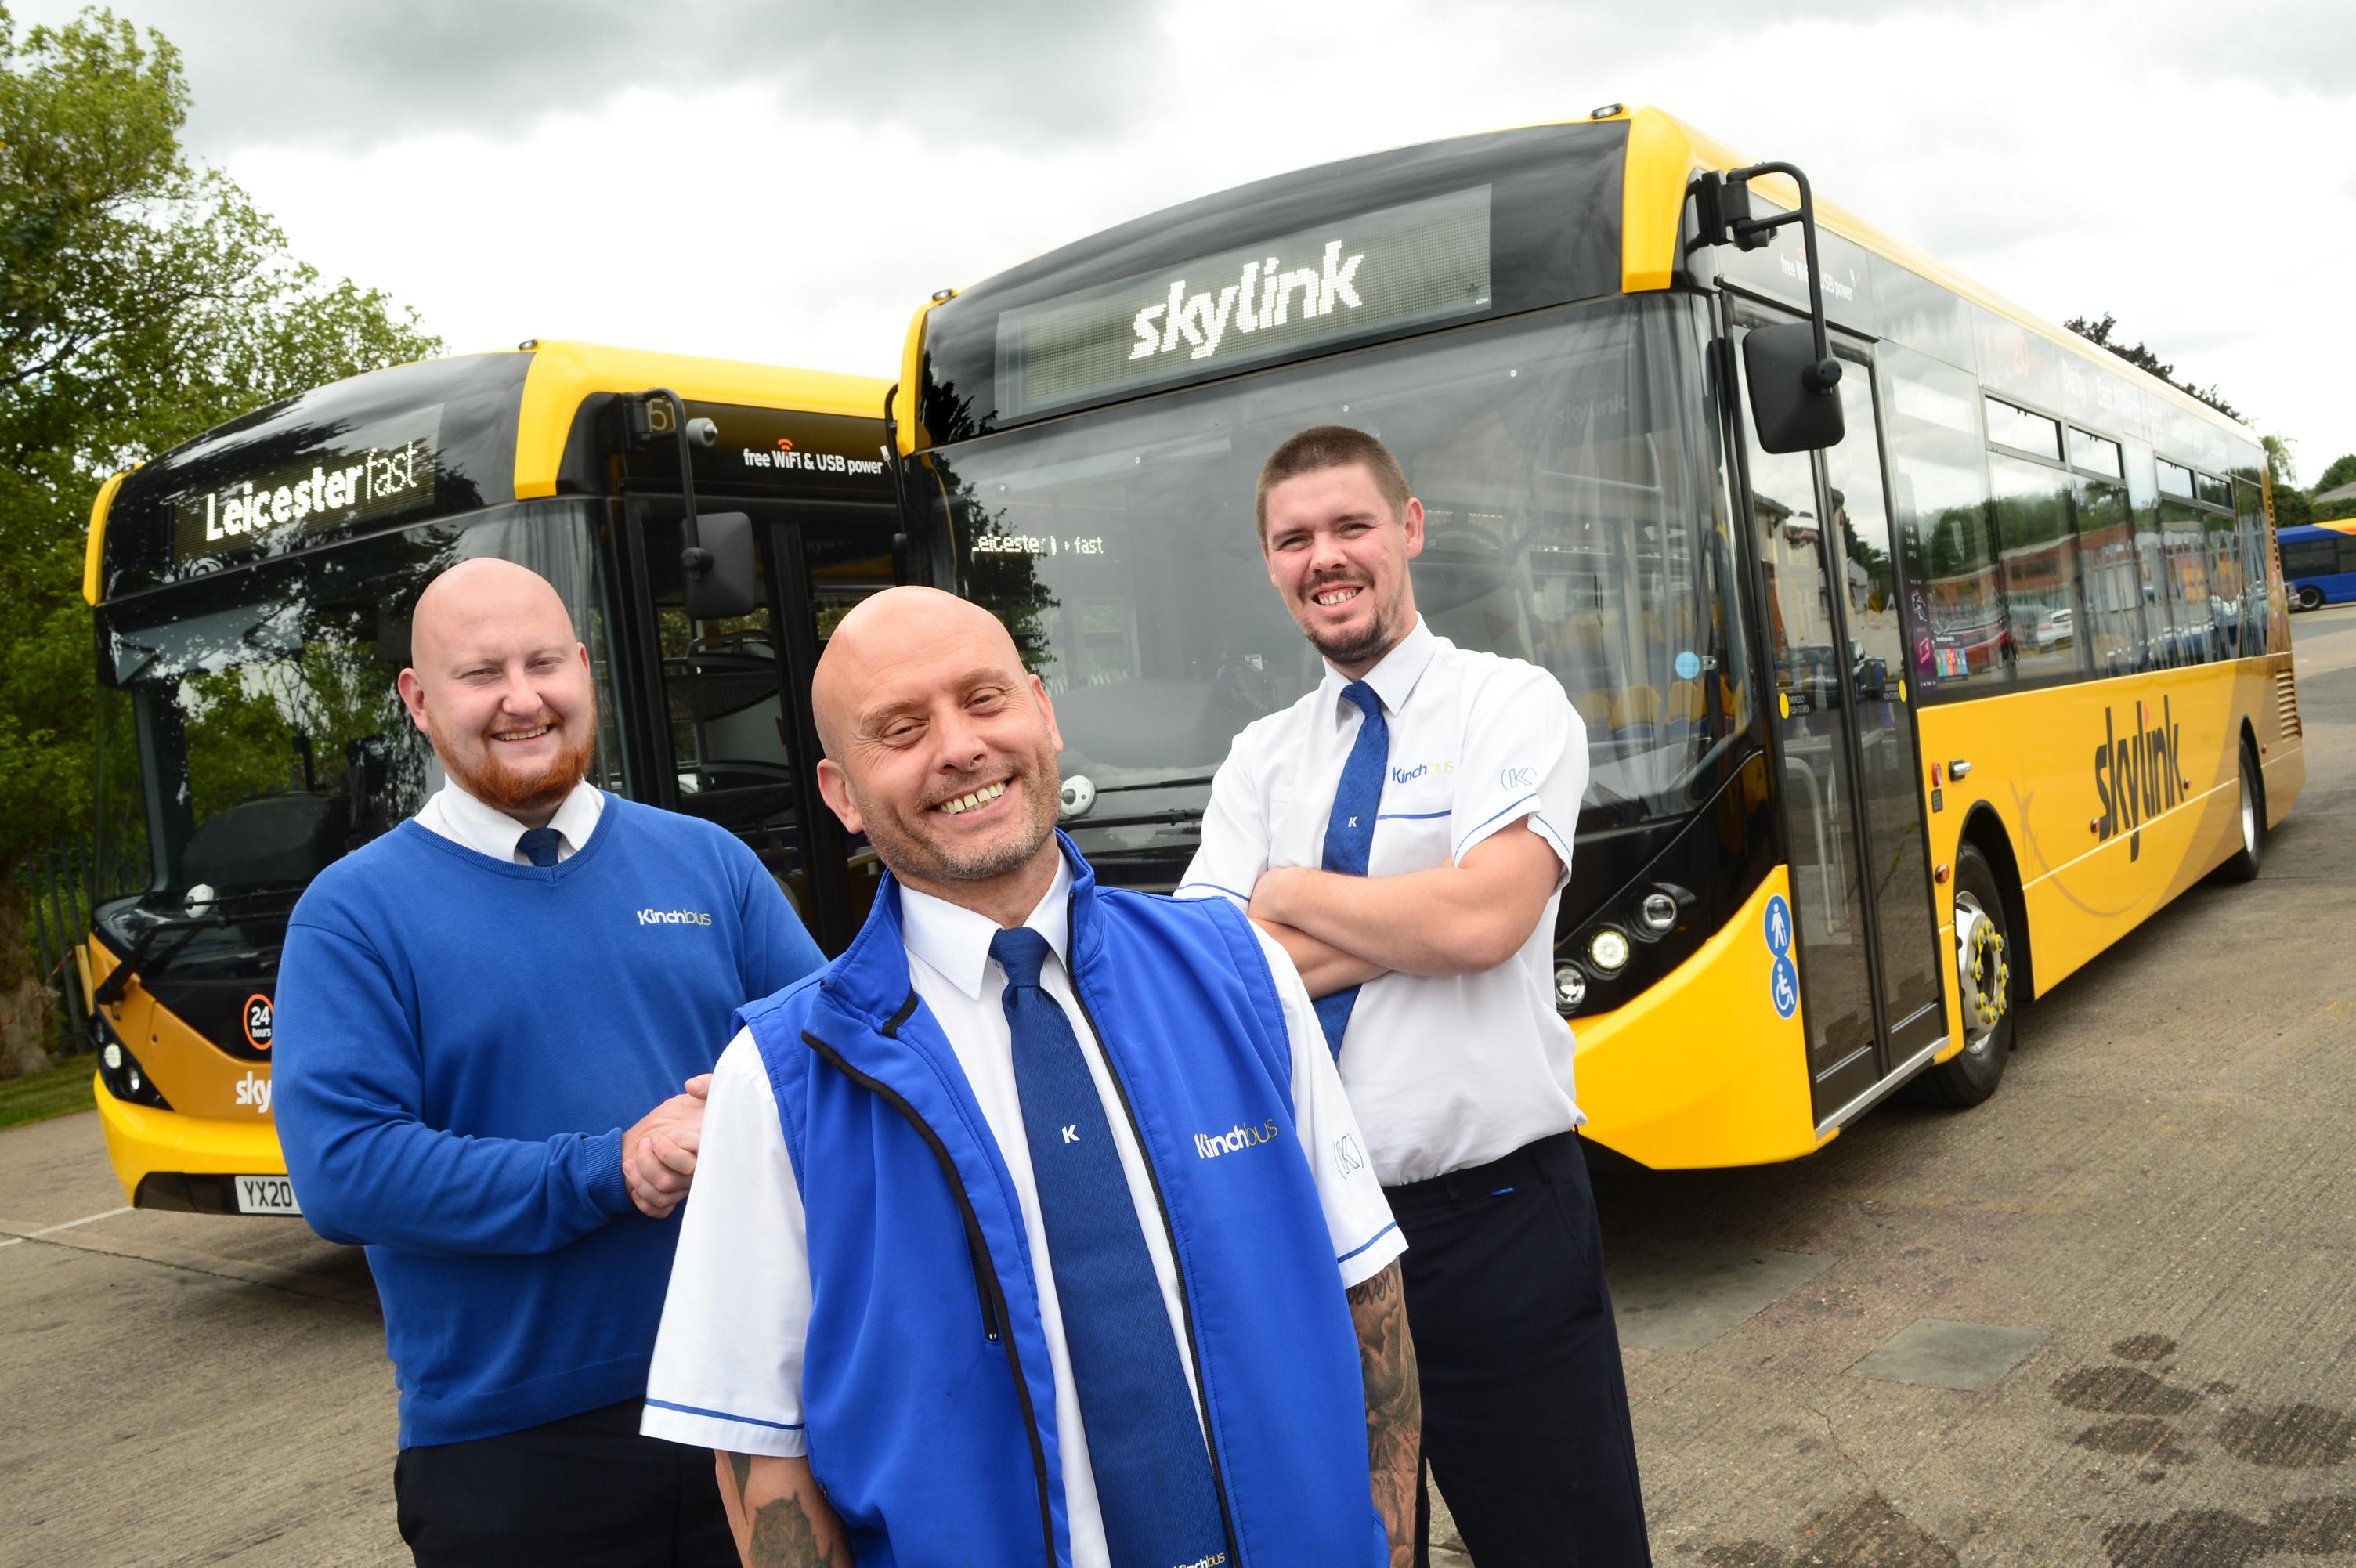 First class upgrade for skylink